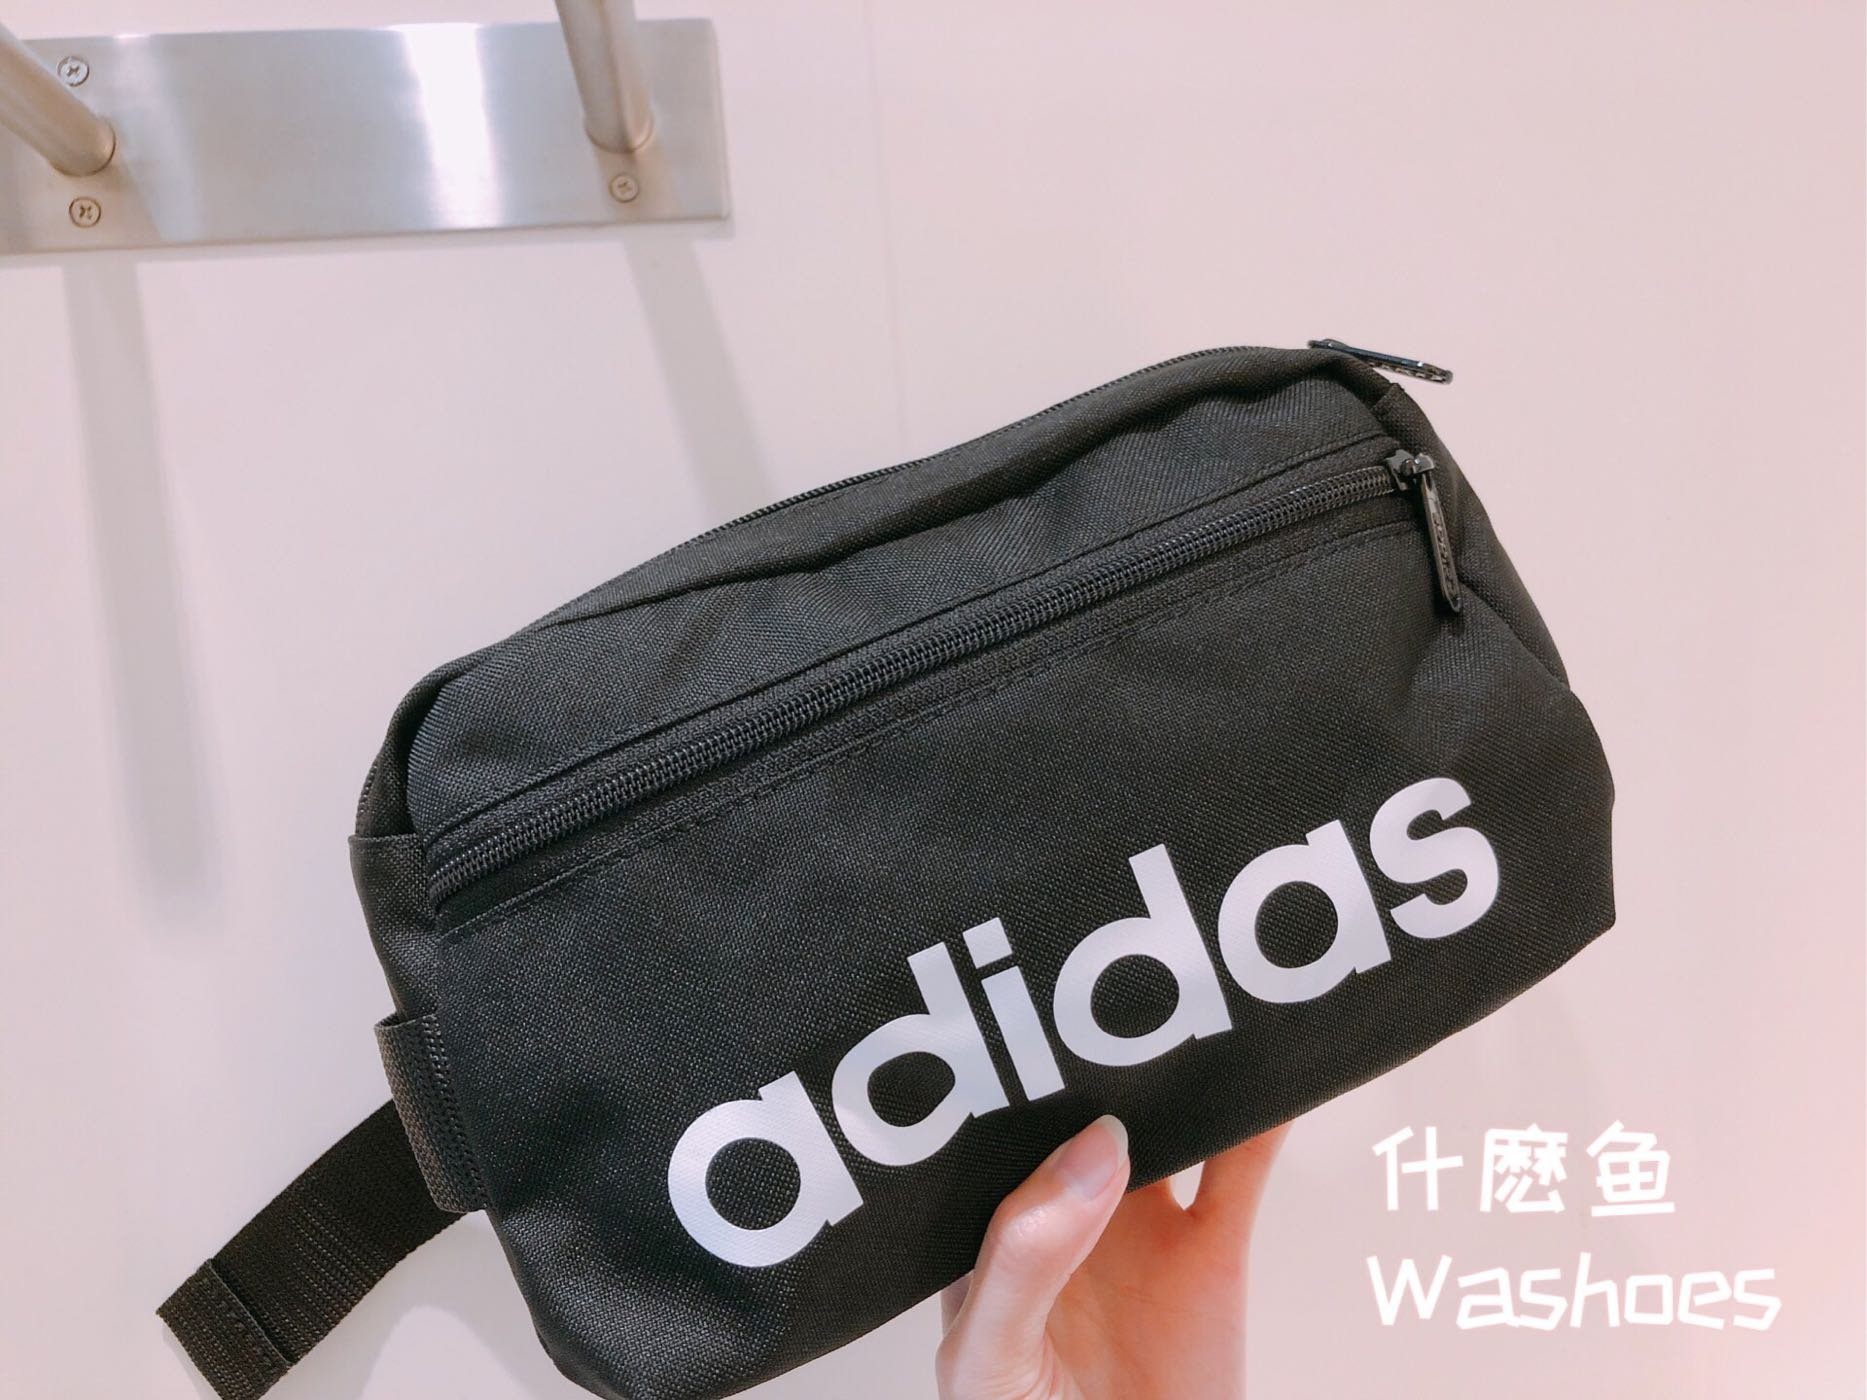 Washoes ADIDAS 愛迪達 側背腰包 Linear Core 黑白 款 LOGO霹靂包 隨身包 DT4827